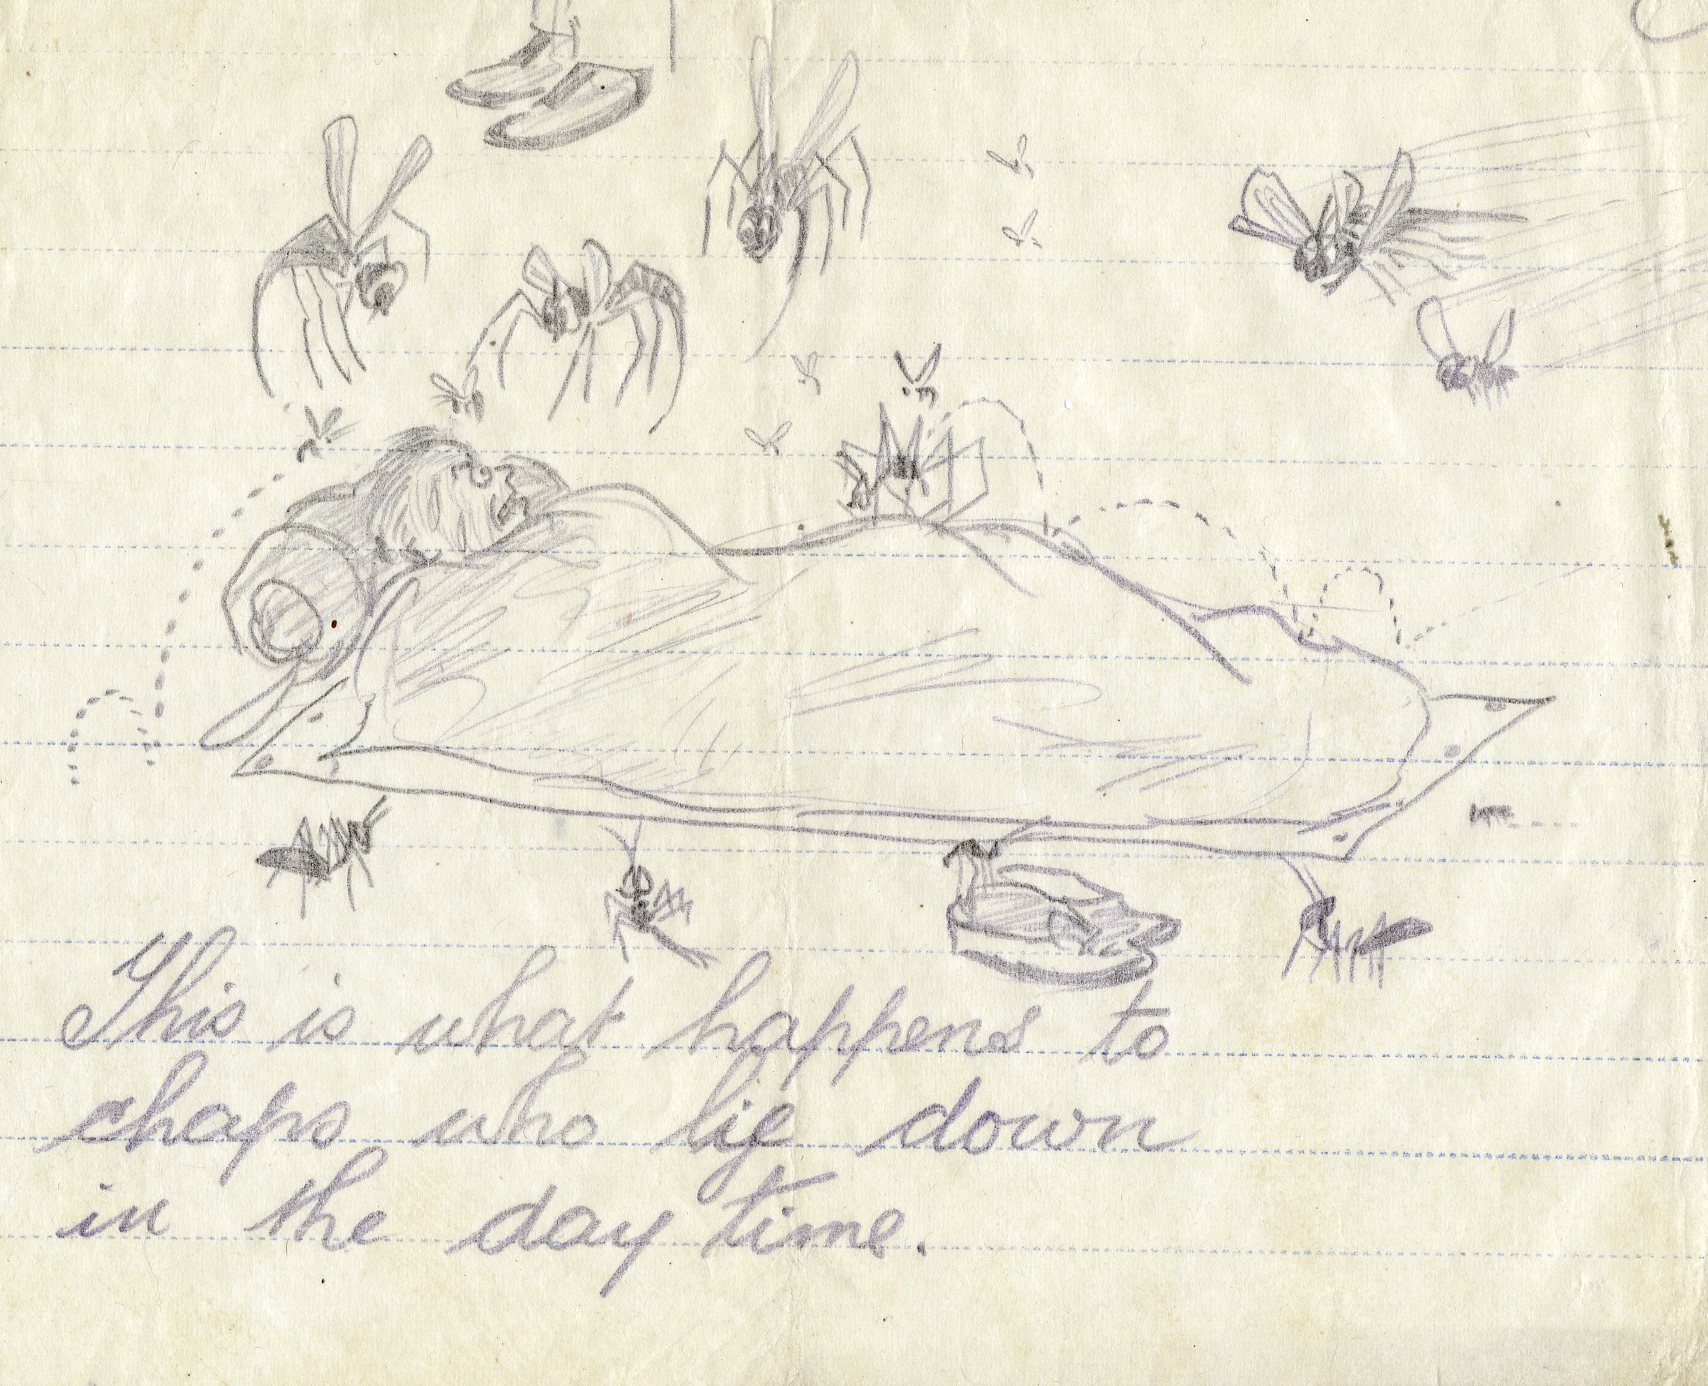 Image: X003-0380/002/022 – Cartoon by A Mech 3 John Roscoe. RAF Museum